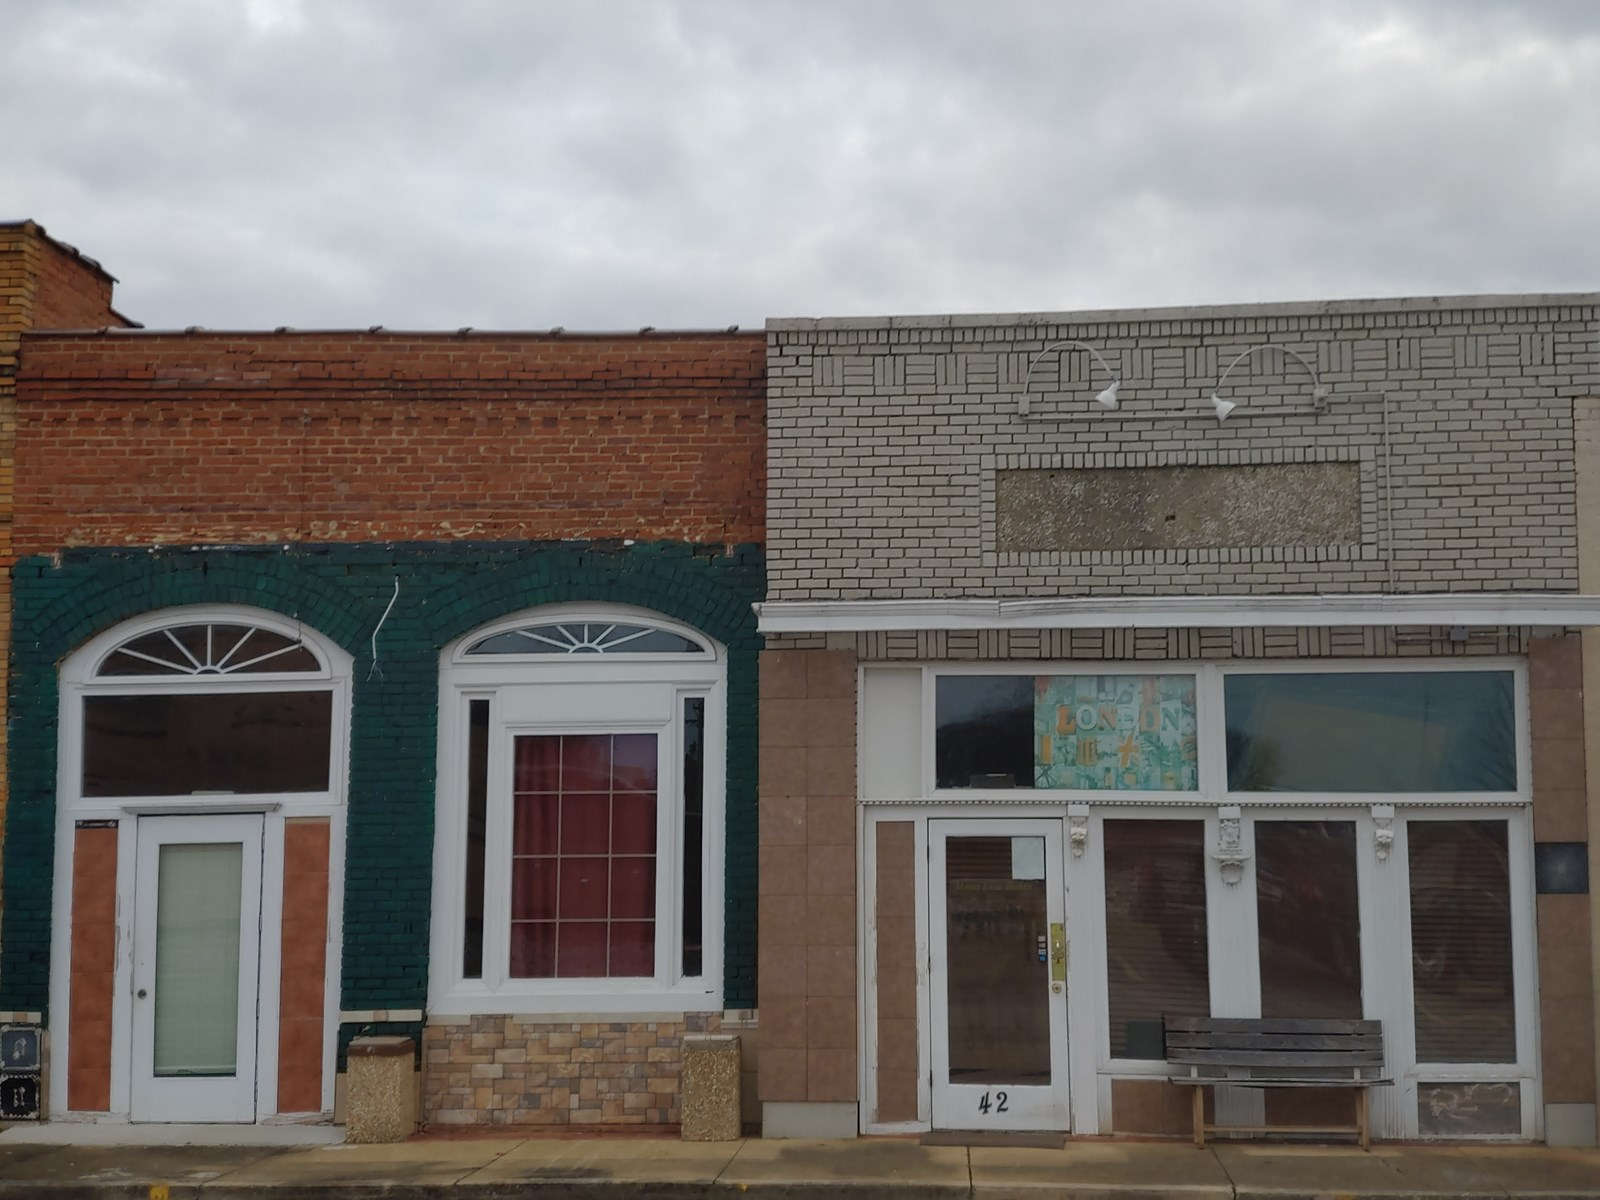 Commercial Property For Sale Falkville AL